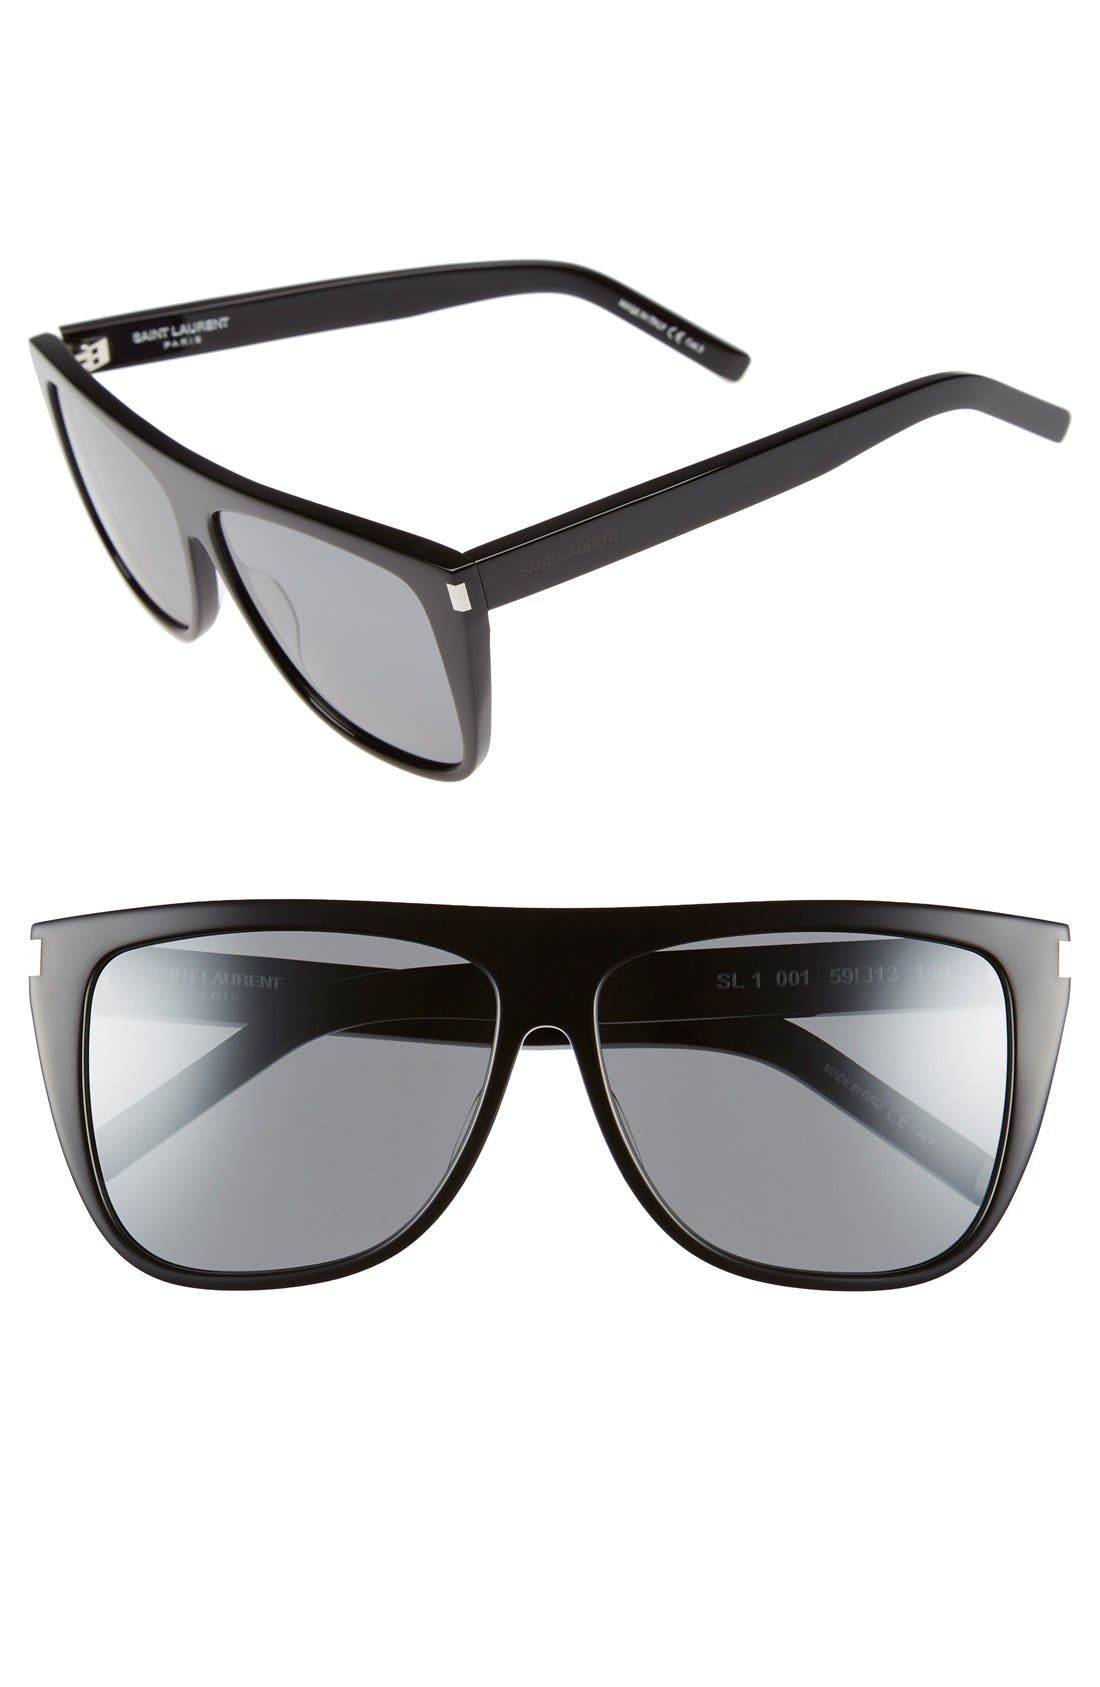 Main Image - Saint Laurent SL1 59mm Flat Top Sunglasses